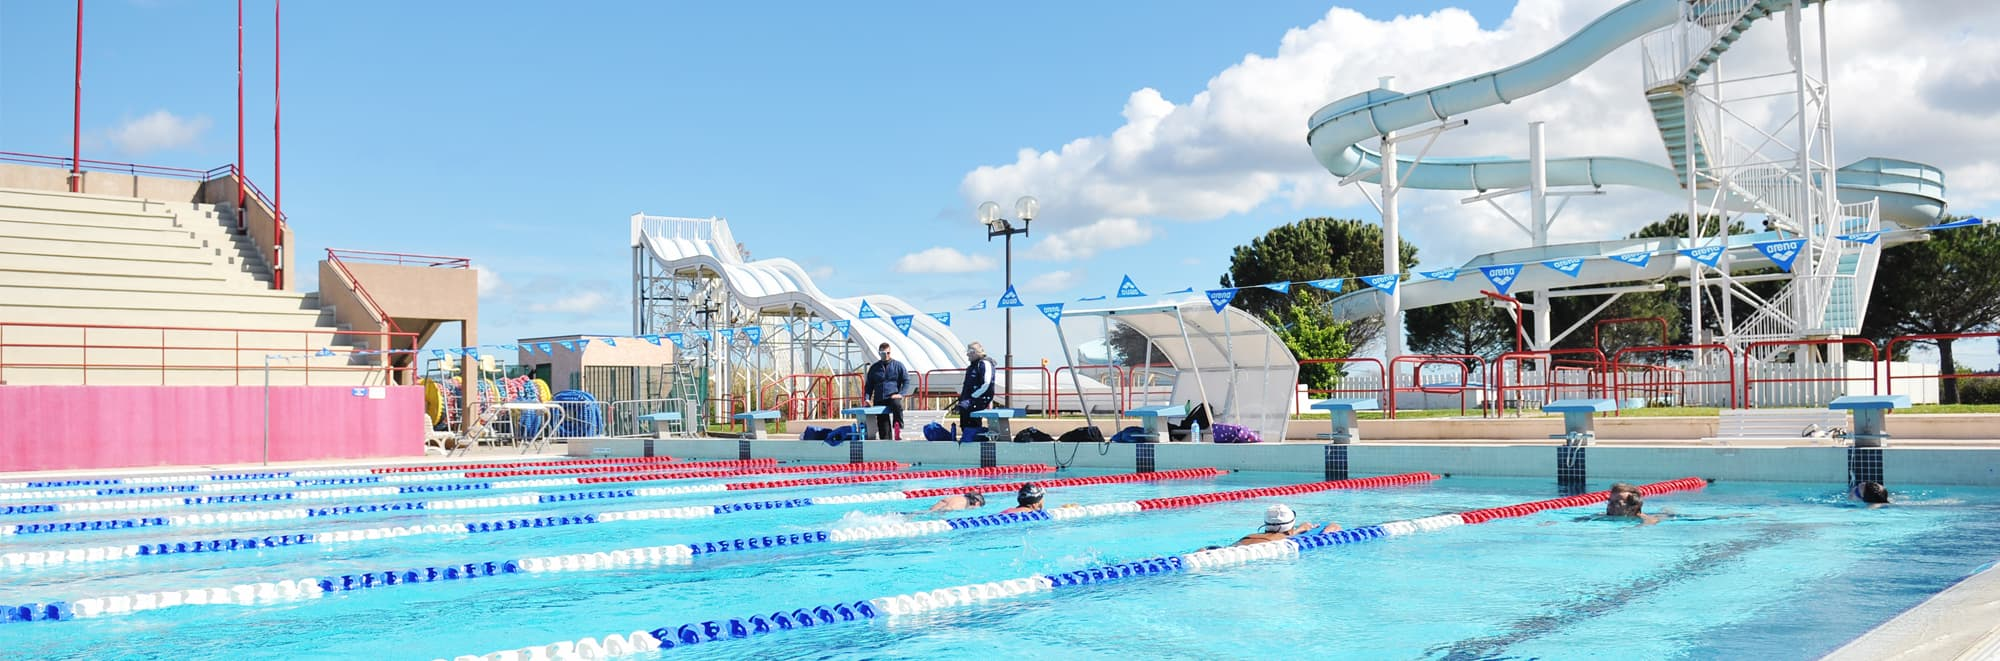 Espace de liberté du Grand Narbonne - Espace Aquatique Outdoor